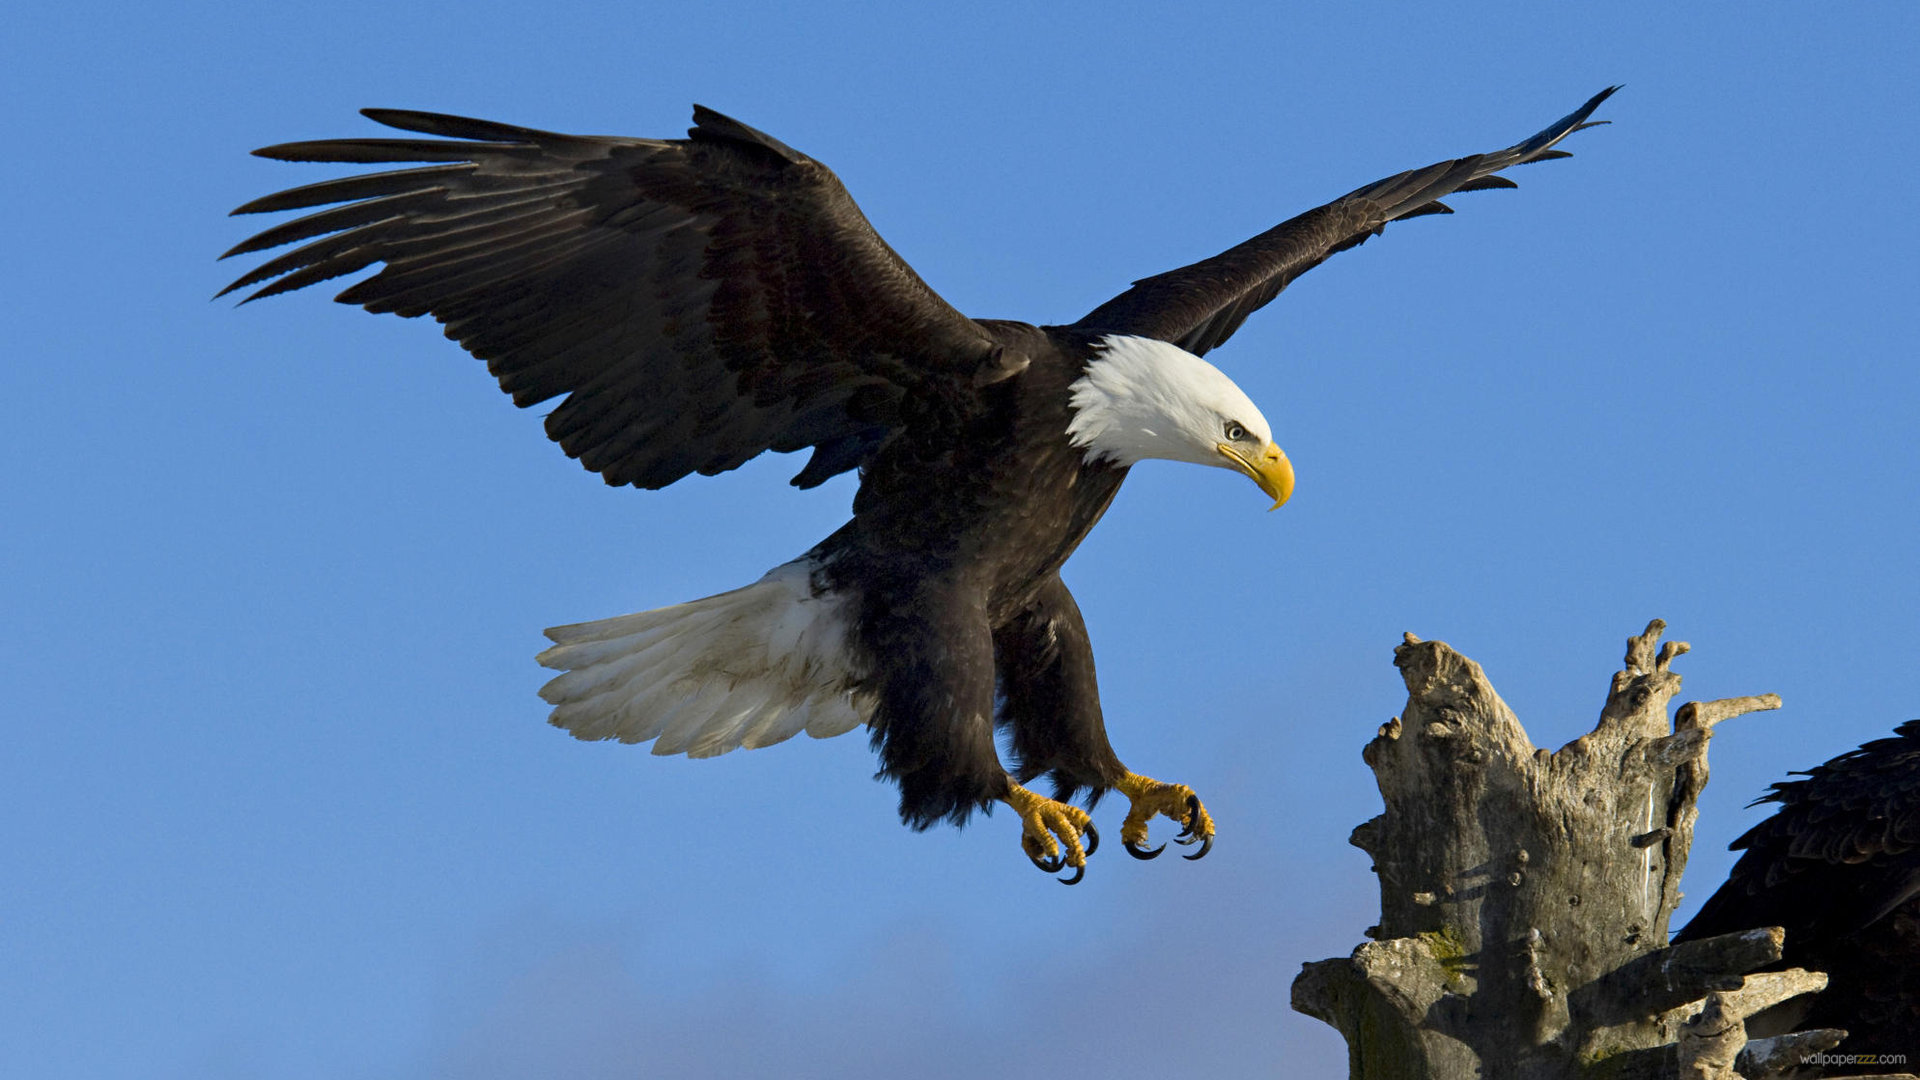 Eagle-13-Wallpaper-Background-Hd